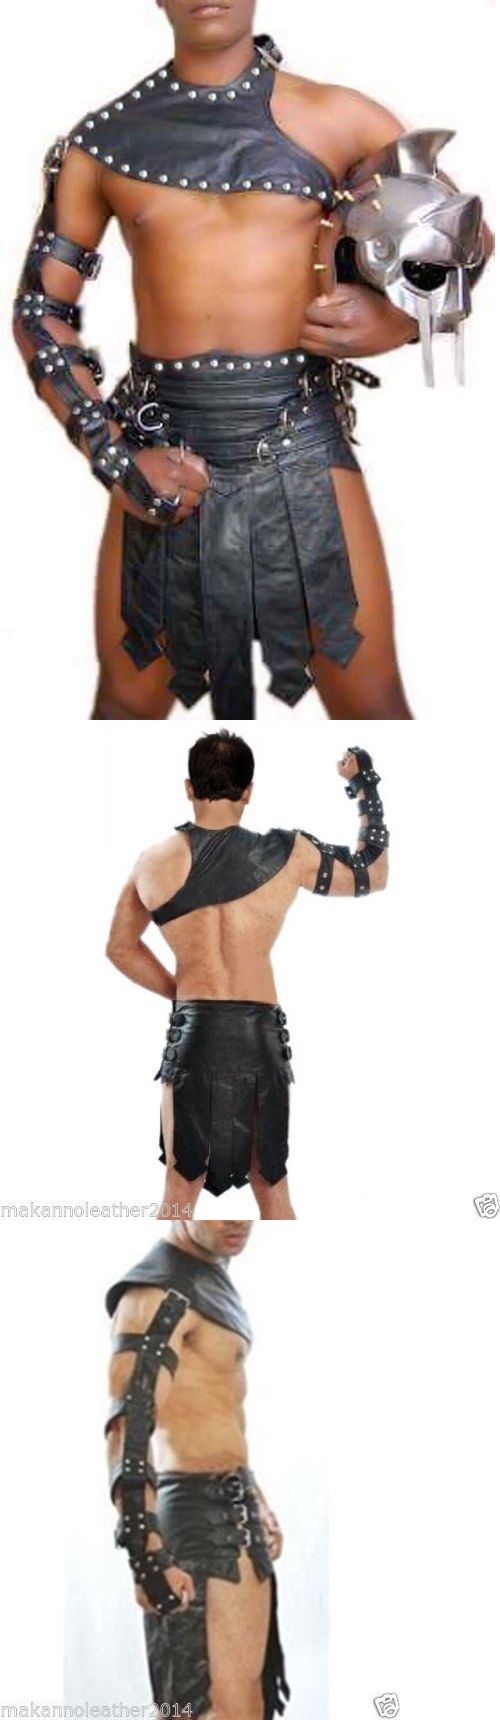 Real-Cow-Leather-3-Piece-Men-Kilt-Set-Gladiator-Roman-Kilt-LARP Halloween